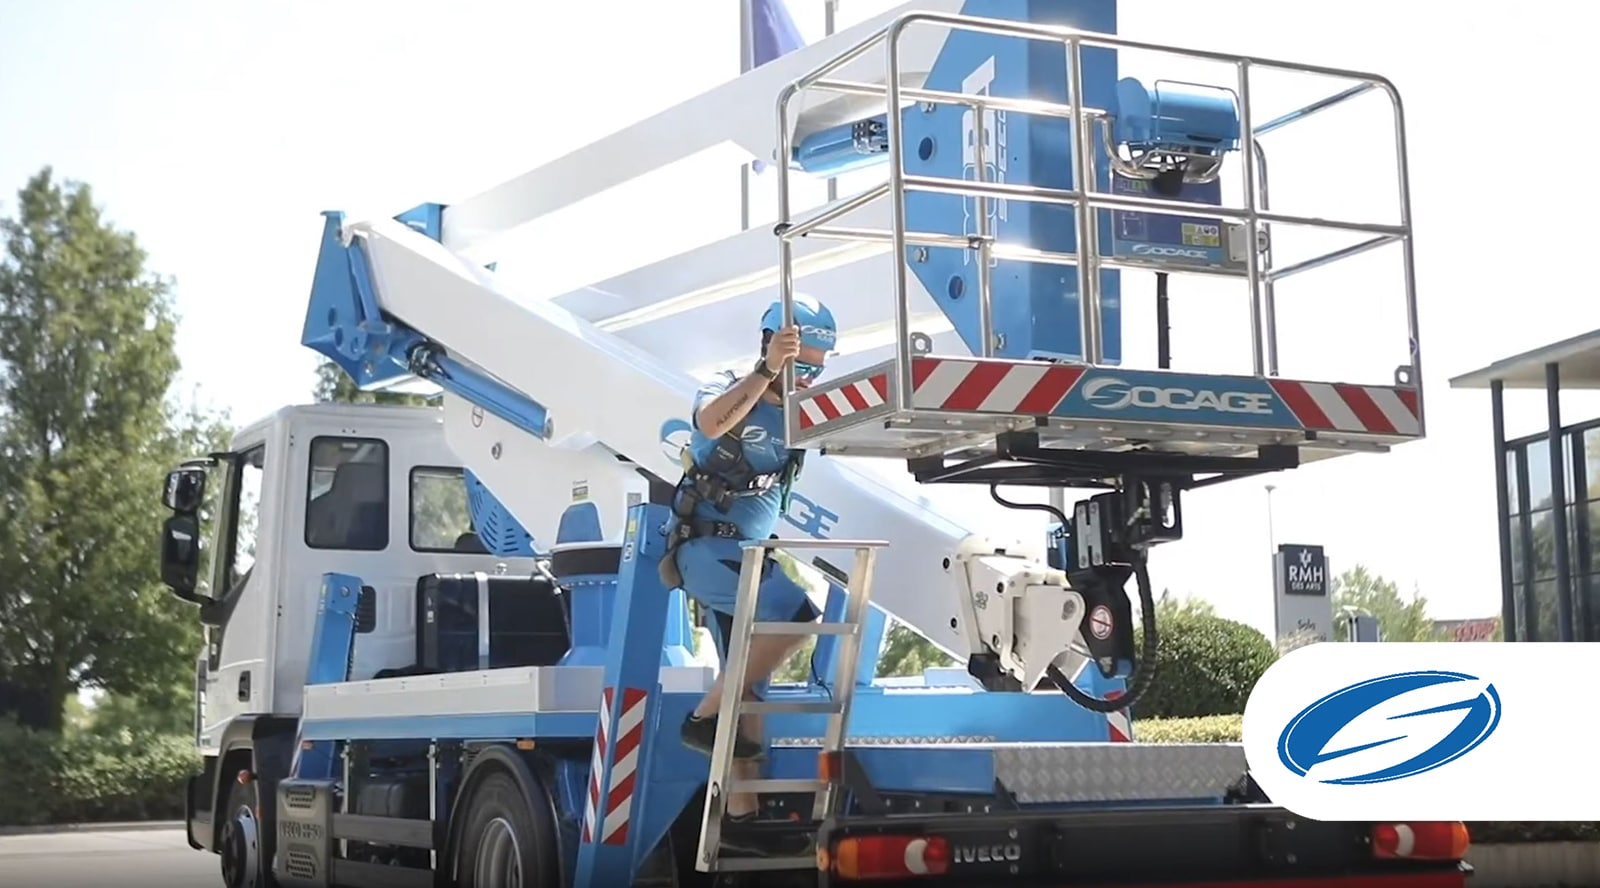 28DA speed camion avec nacelle SOCAGE